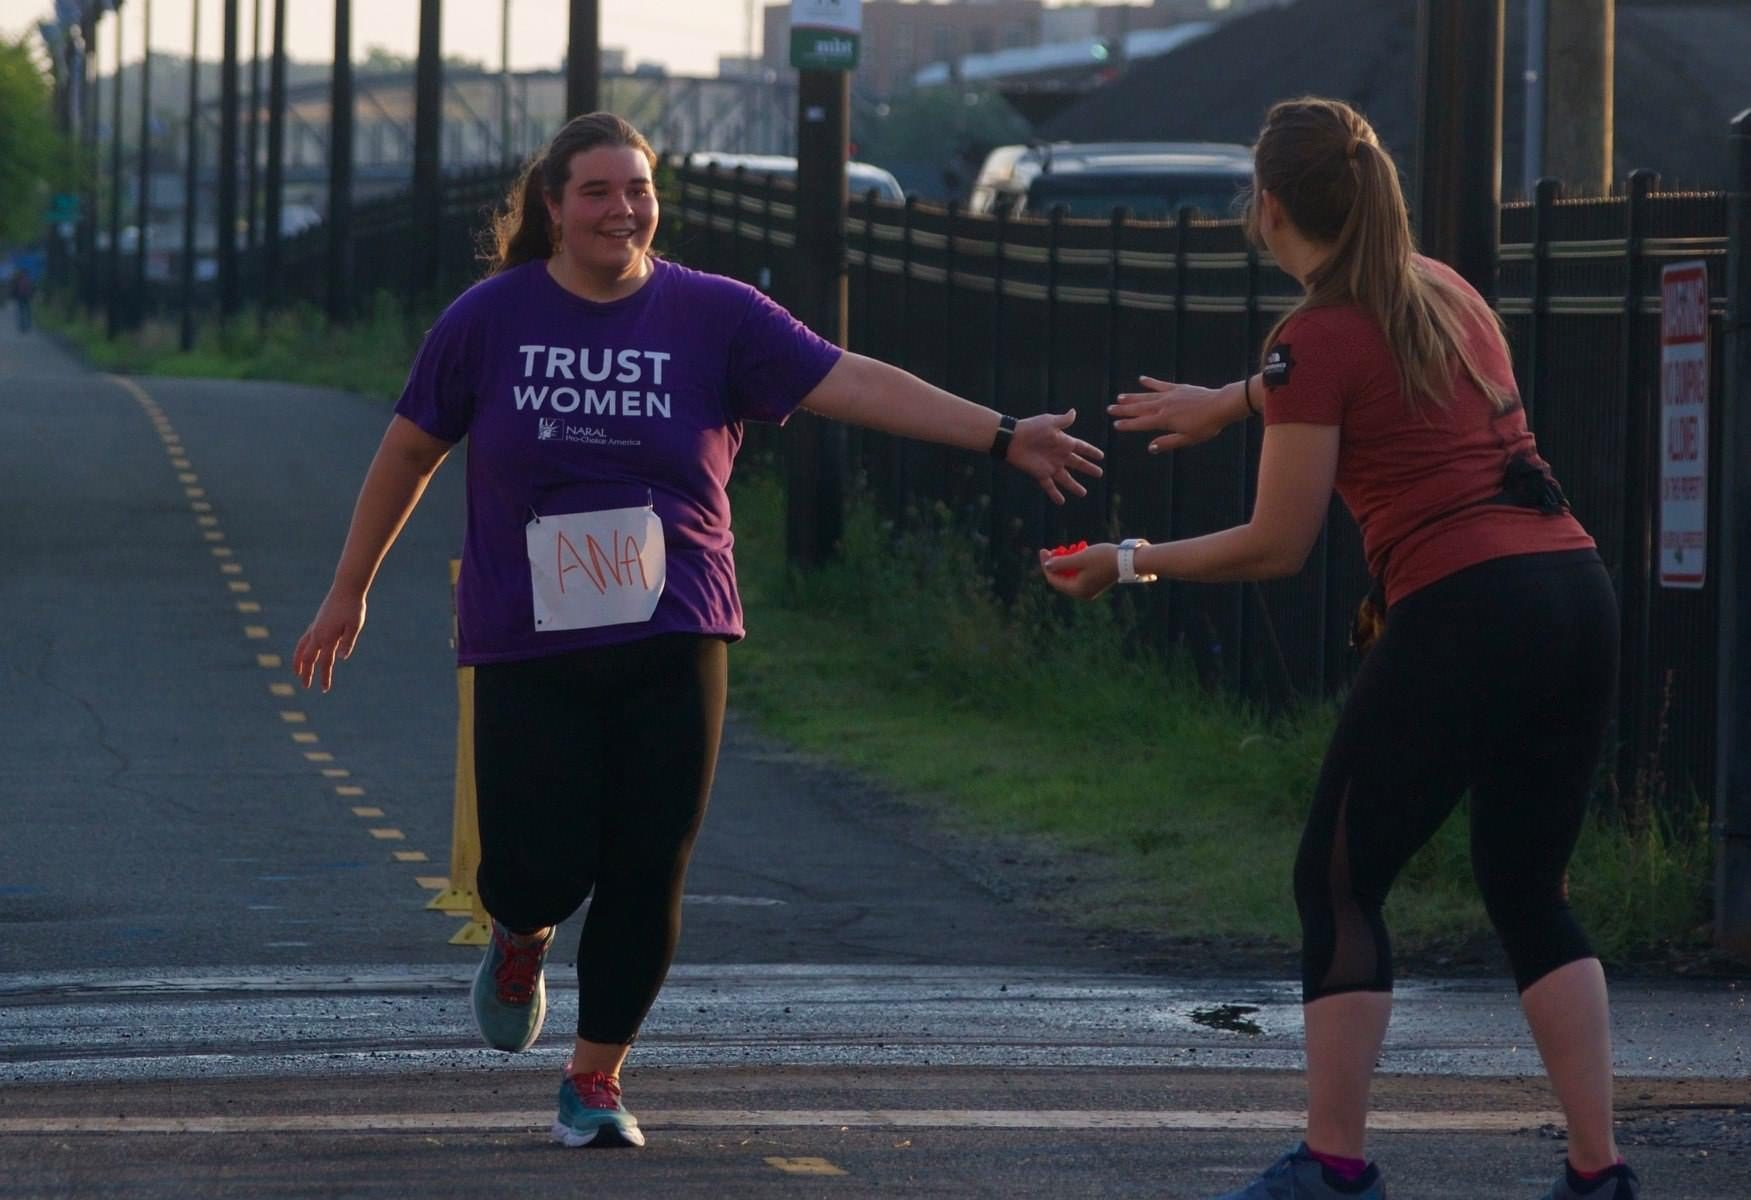 Ana Little Sana running a sunrise 6K in a purple teeshirt and giving someone a high-five